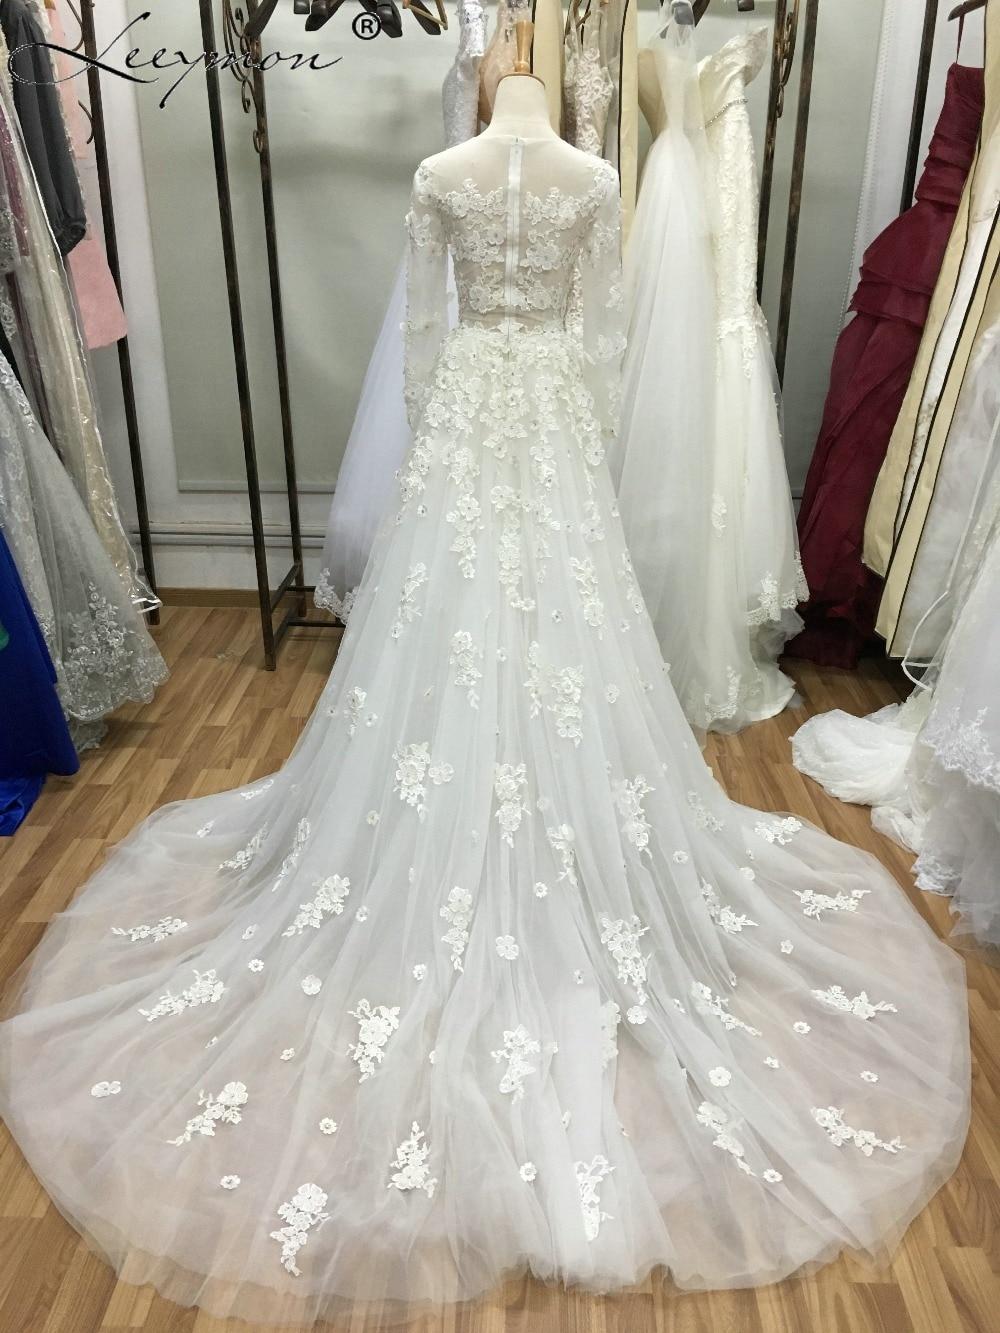 Großzügig Brautkleider Ni Fotos - Brautkleider Ideen ...